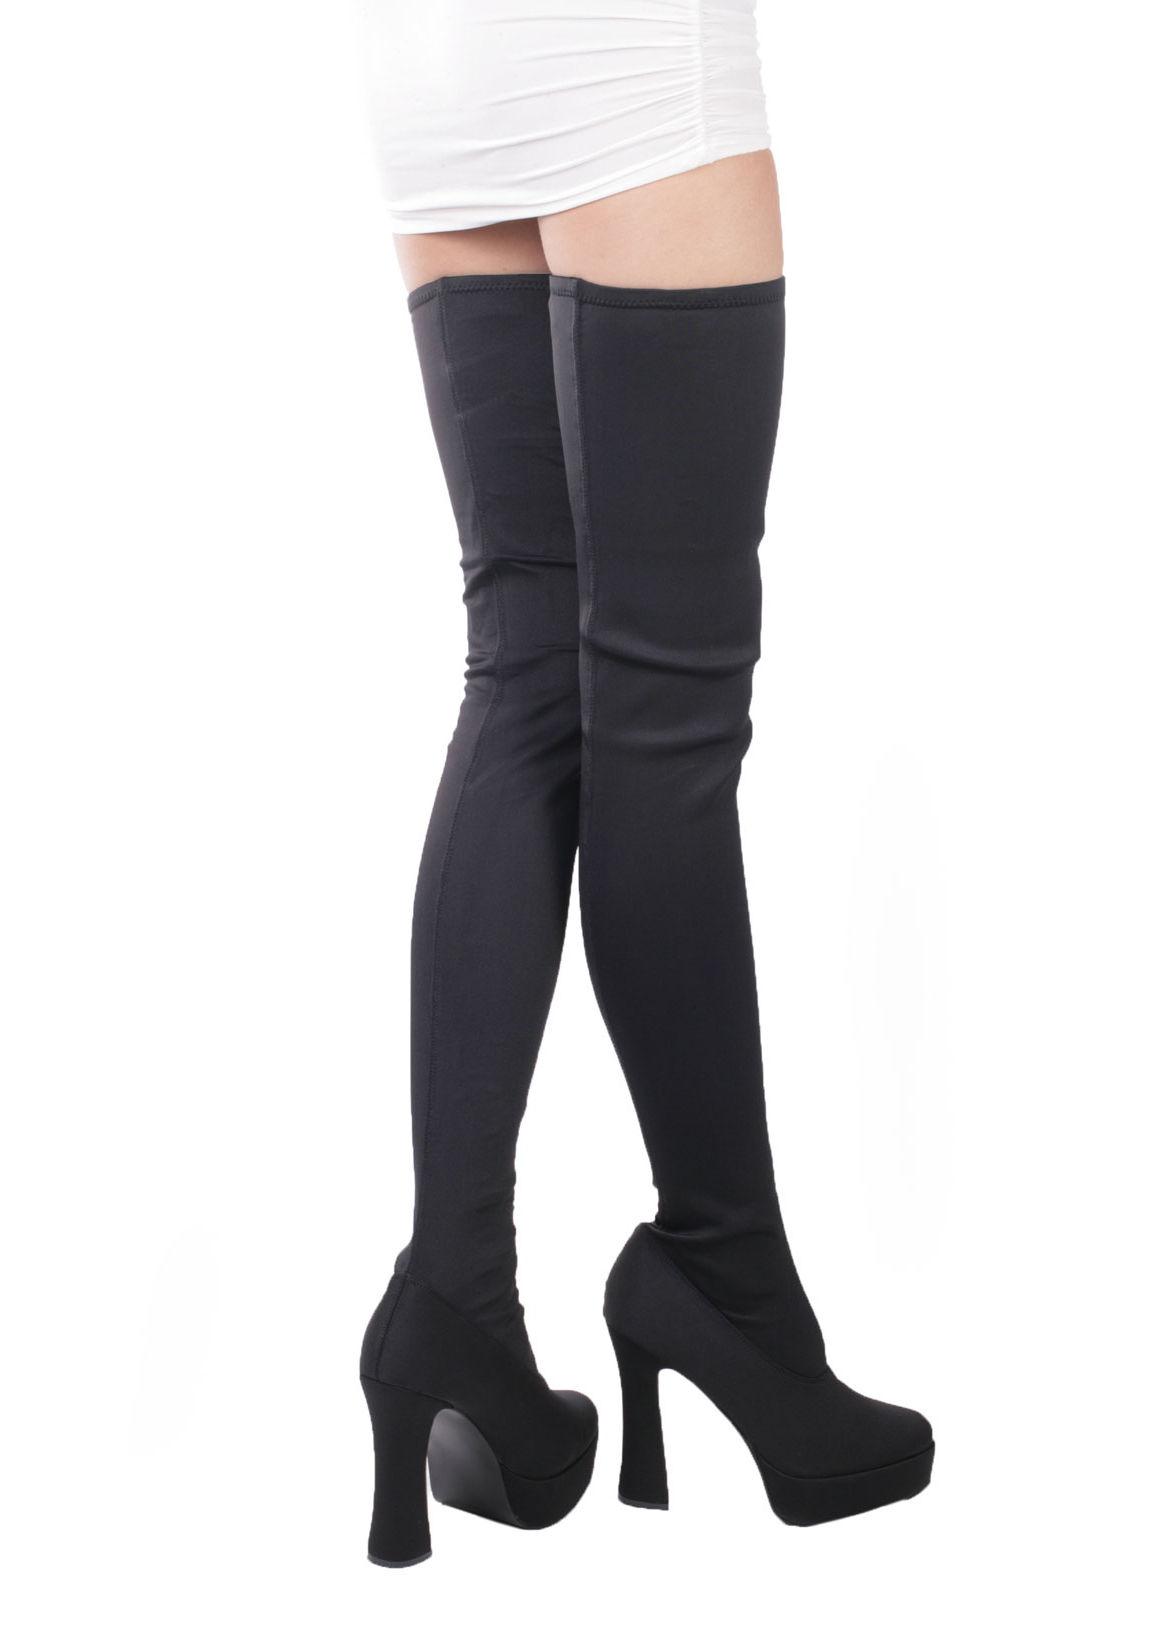 pleaser electra 3000 s 5 inch heel thigh high